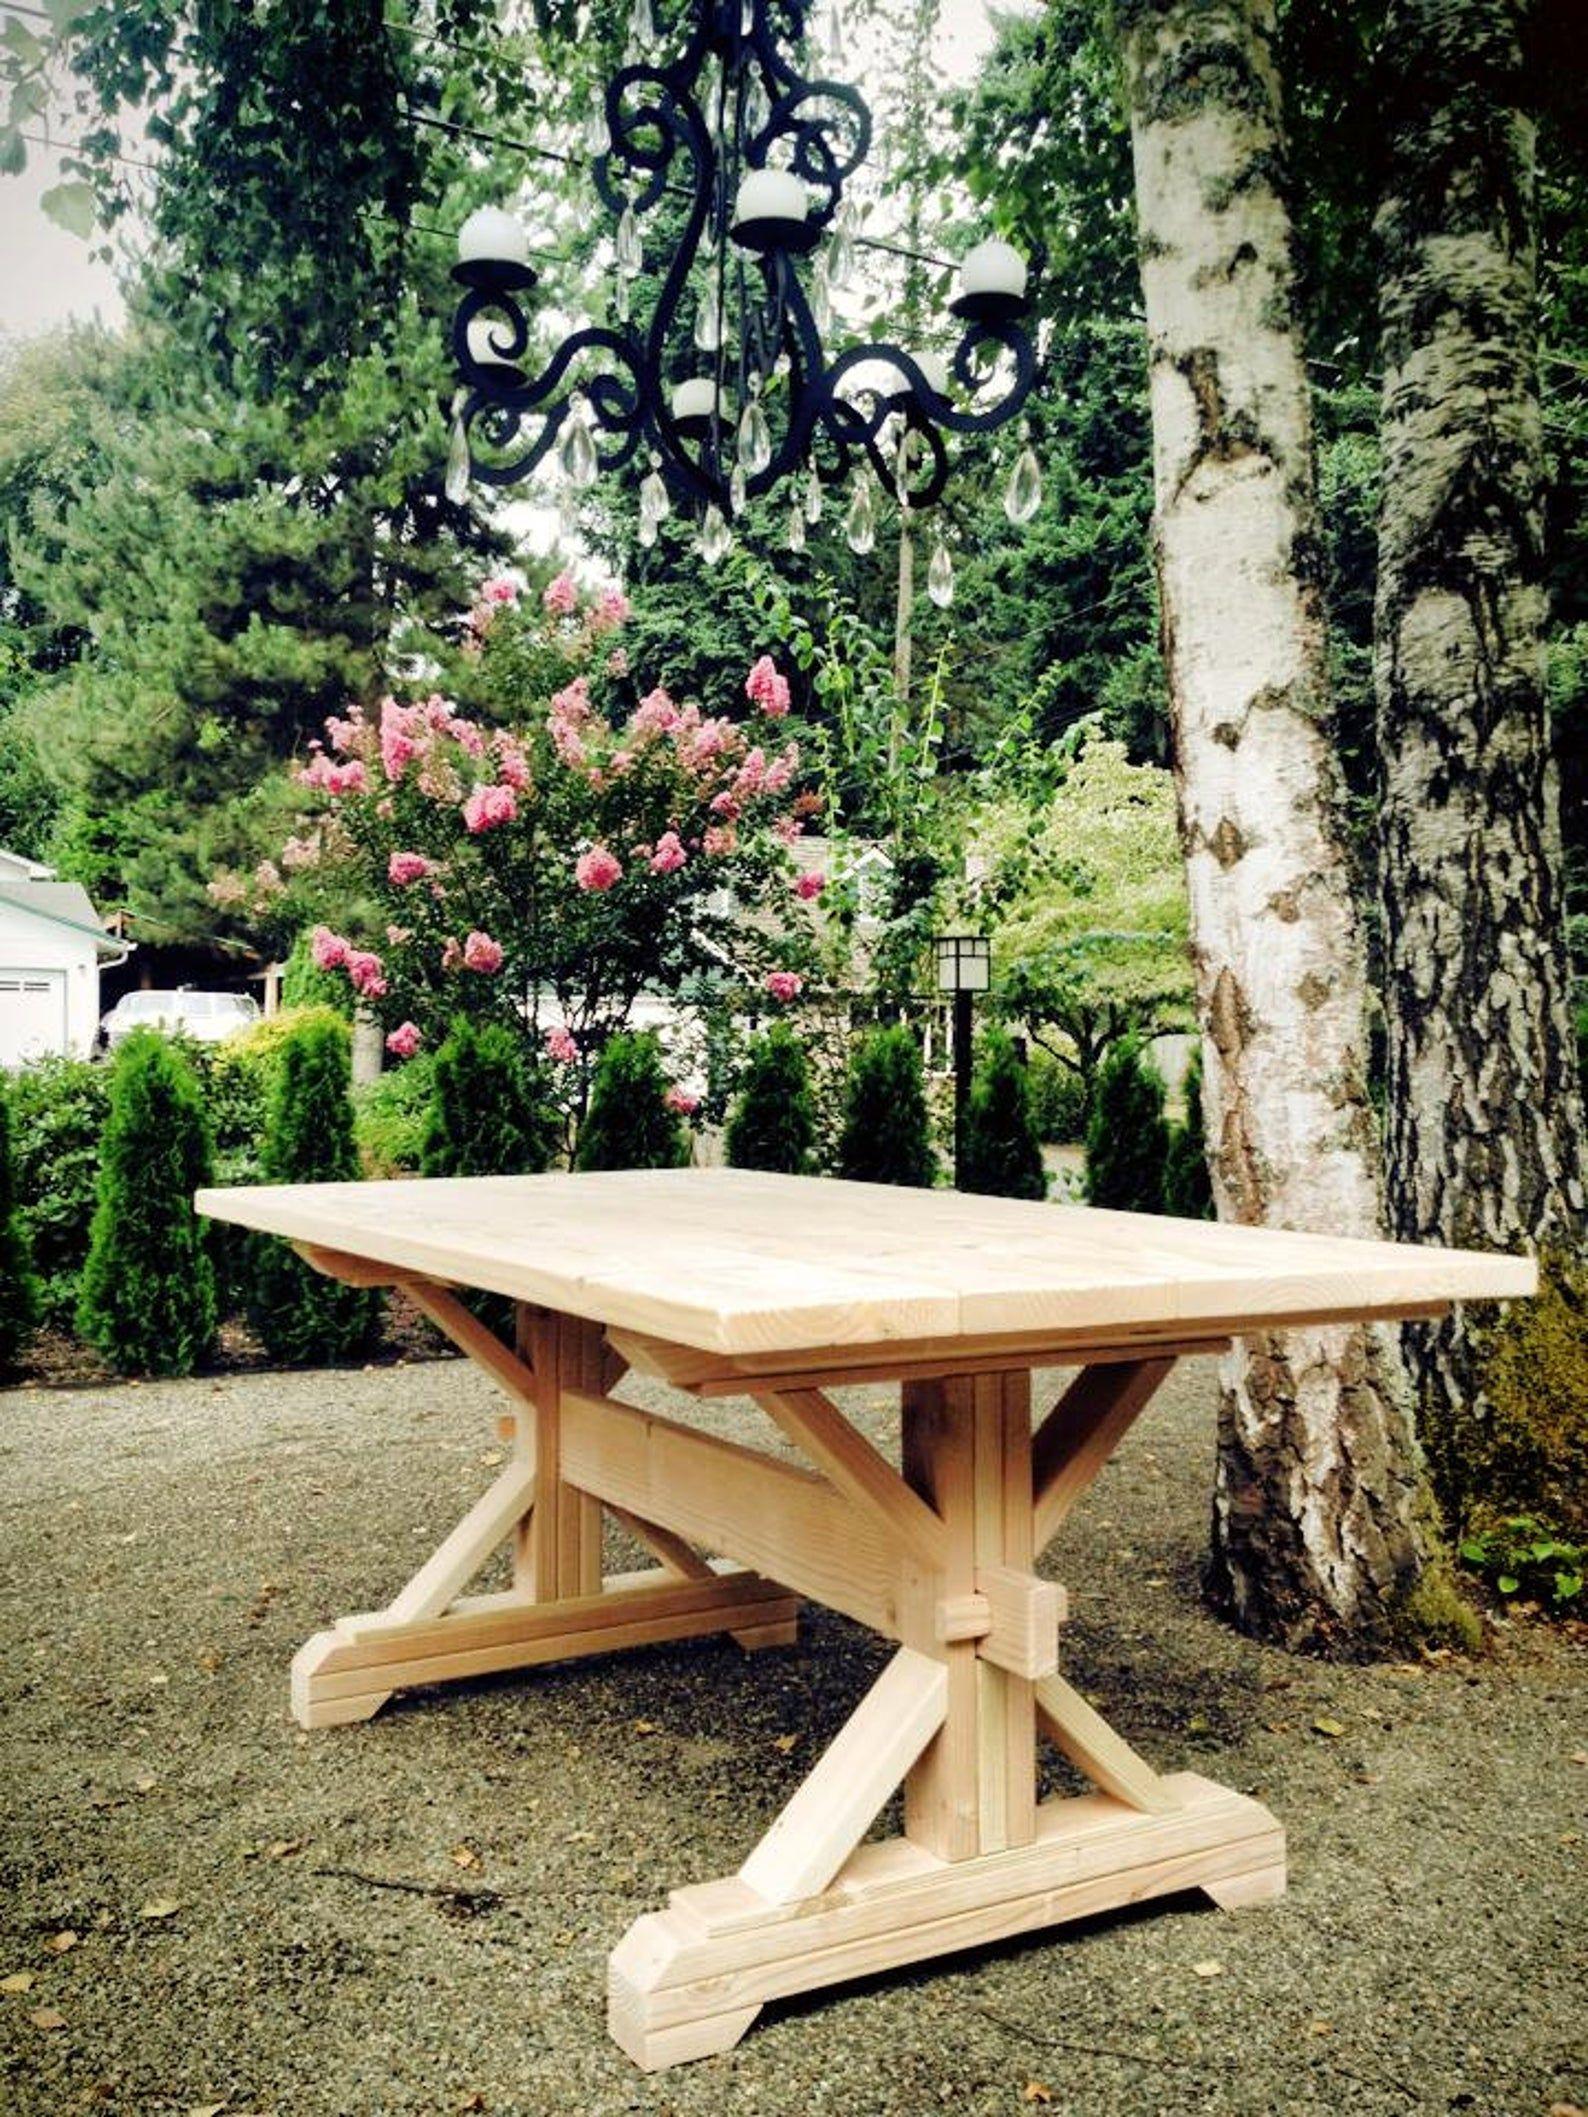 Beverage Table Coffee Table Plans Diy Coffee Table Plans Coffee Table Blueprints